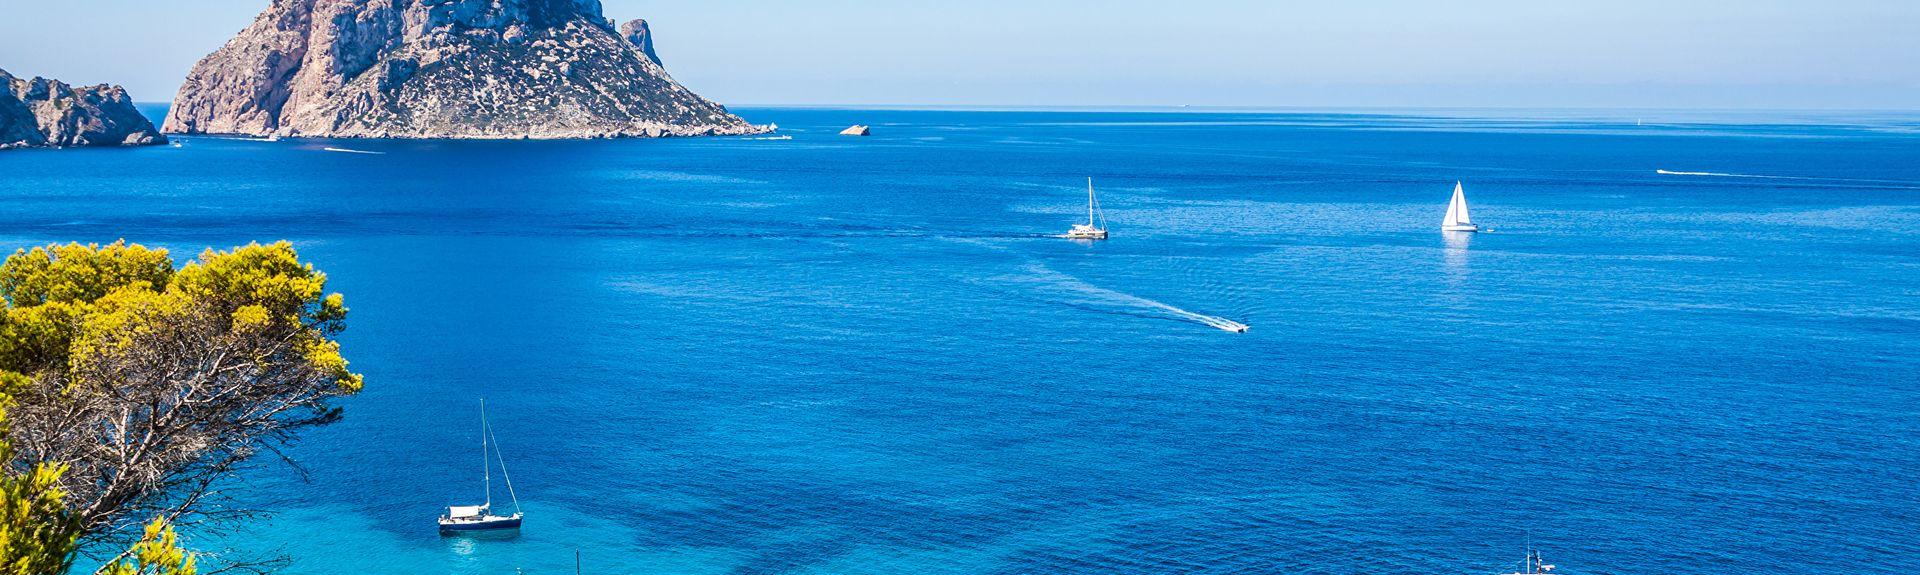 Cala de Bou, Sant Josep de sa Talaia, Balearic Islands, Spain